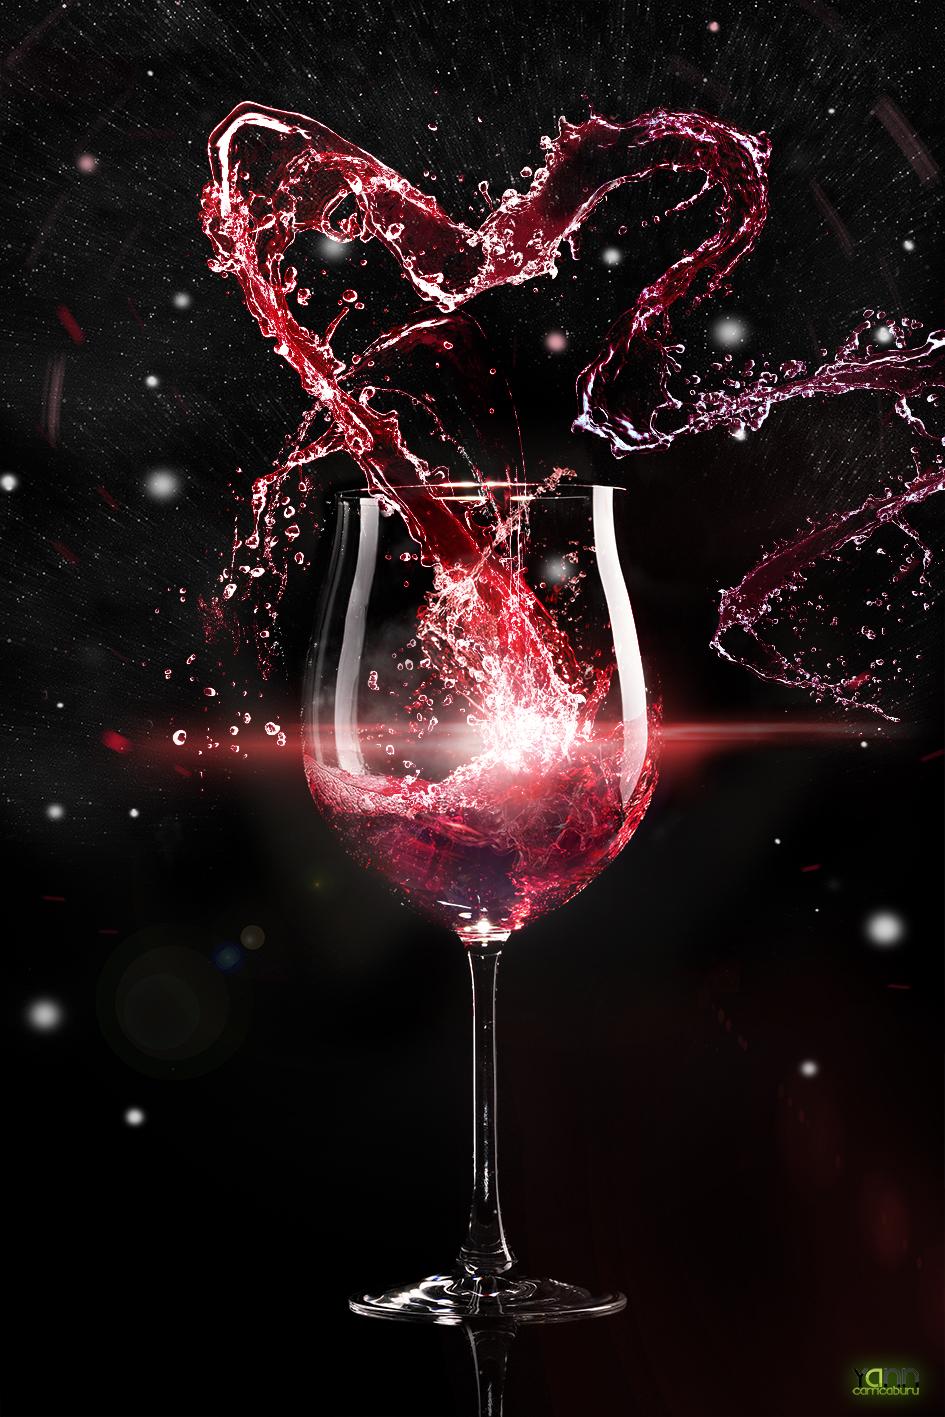 Vin-montage